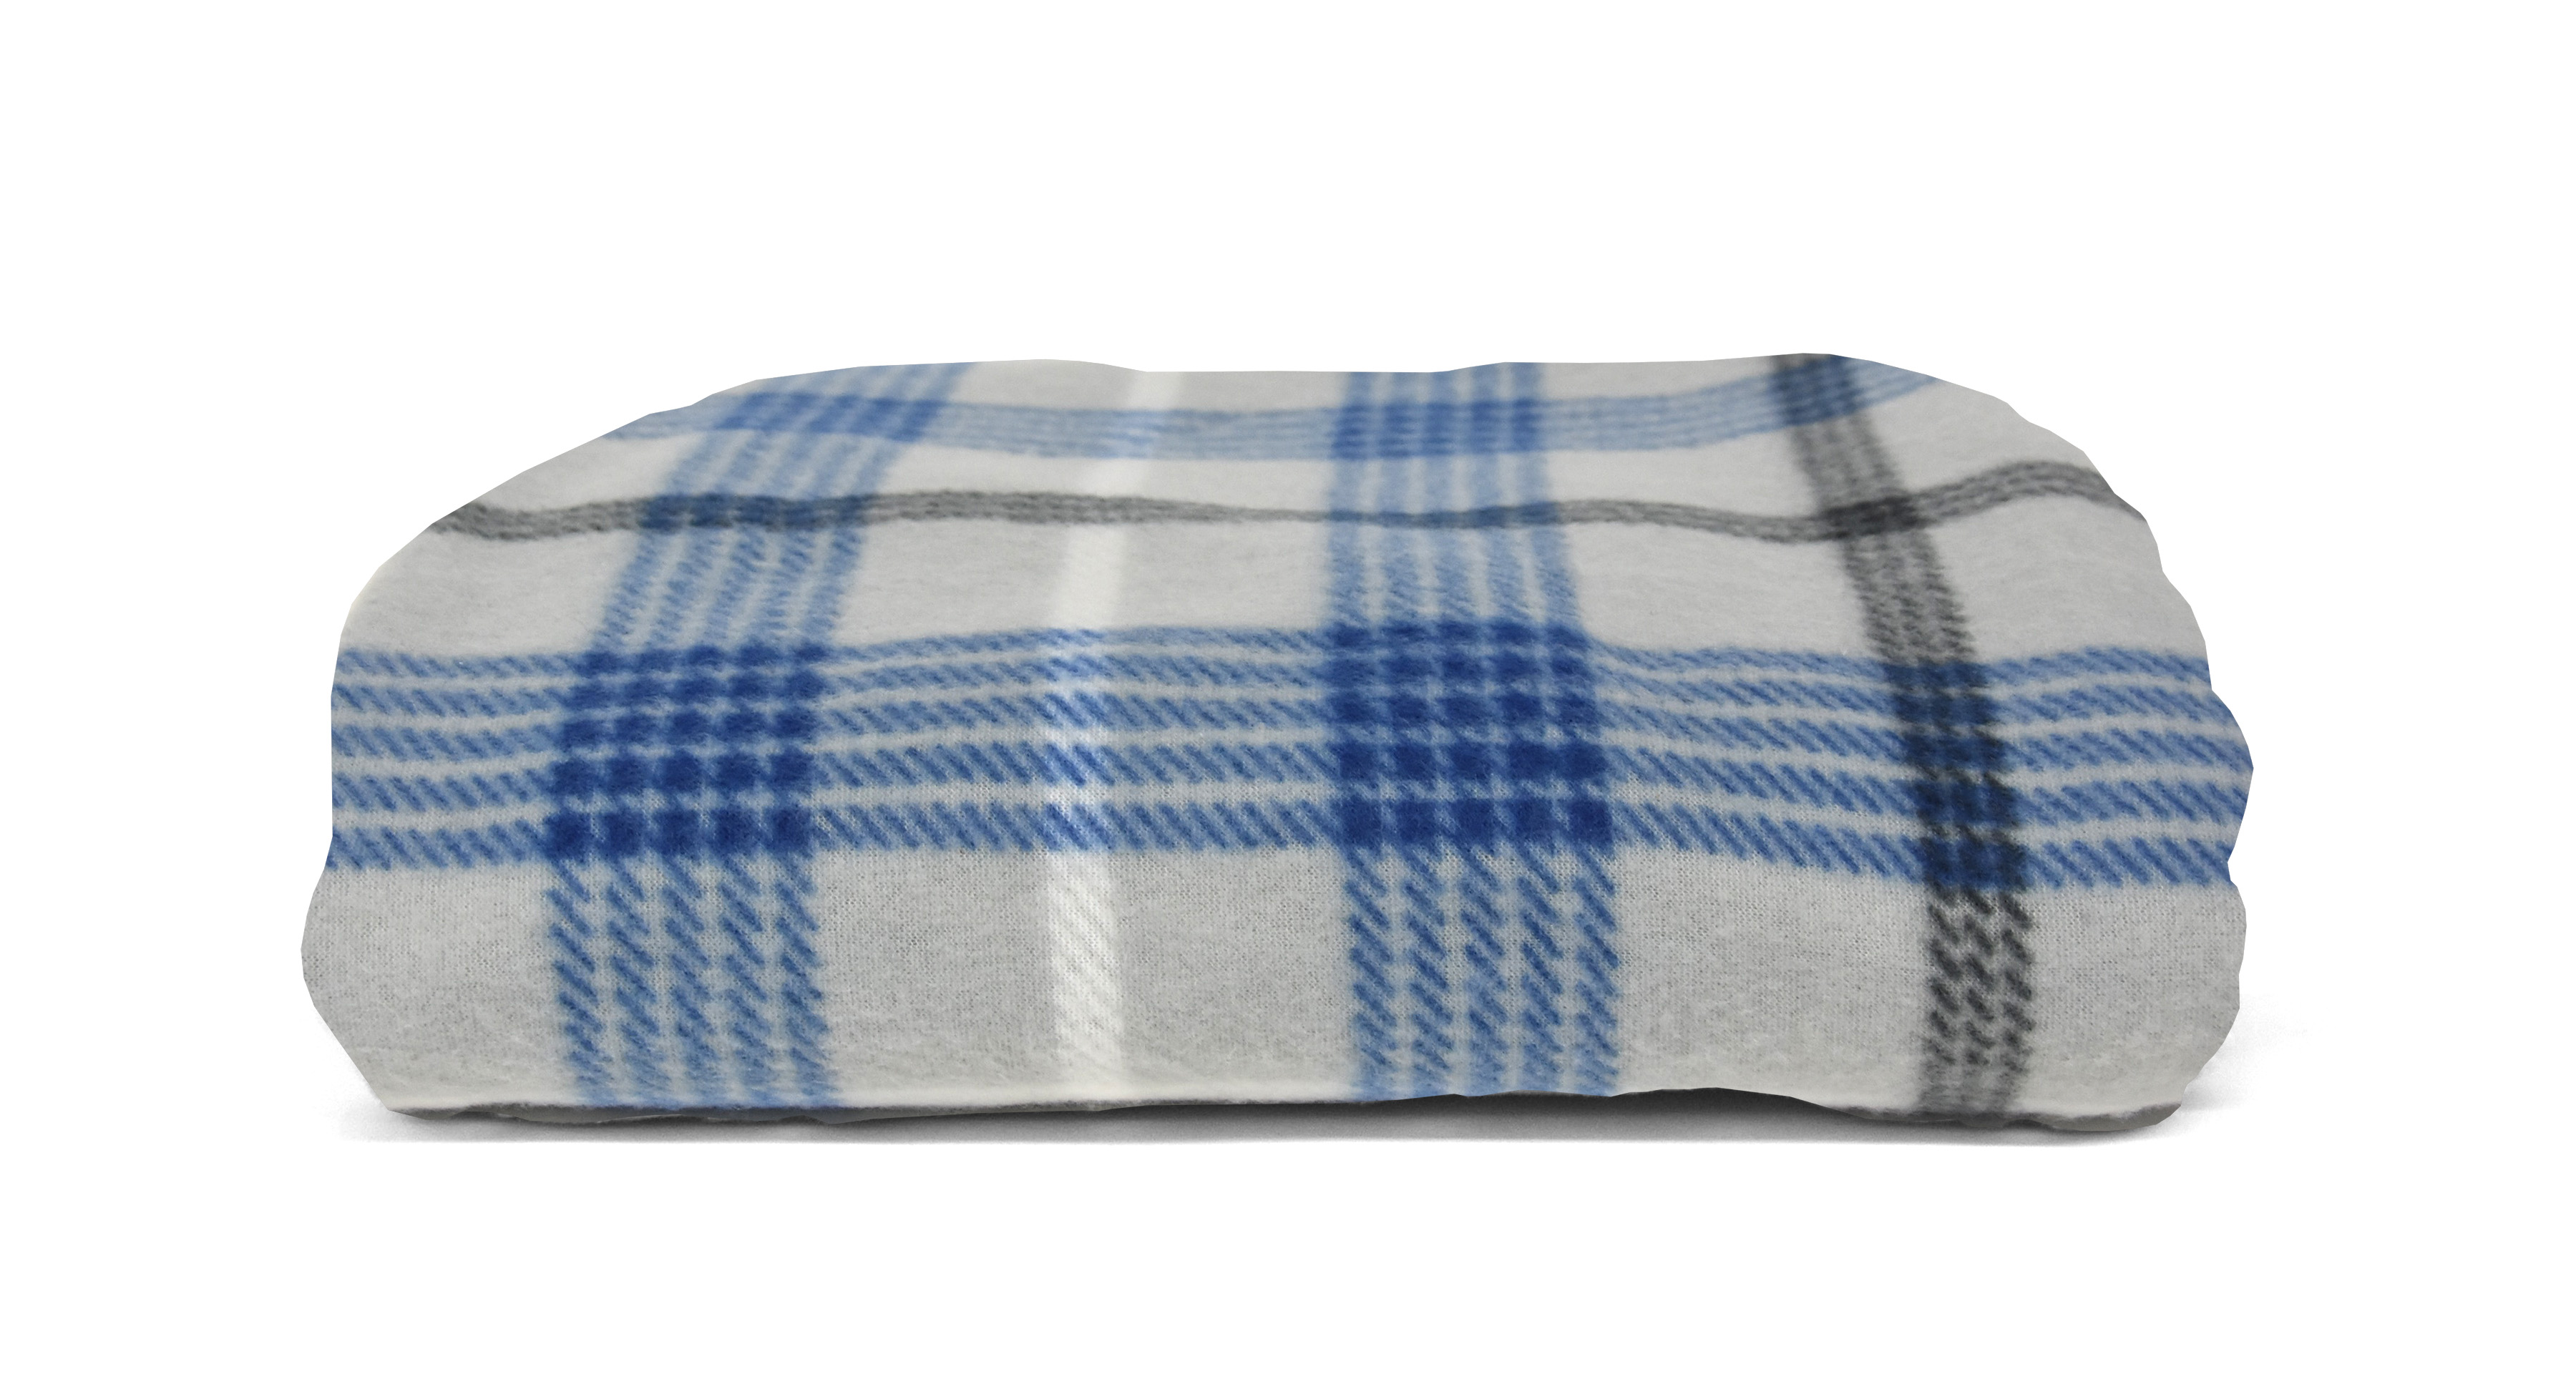 "Mainstays Fleece Plush Throw Blanket, 50"" X 60"", Blue and Gray Plaid - Walmart.com"